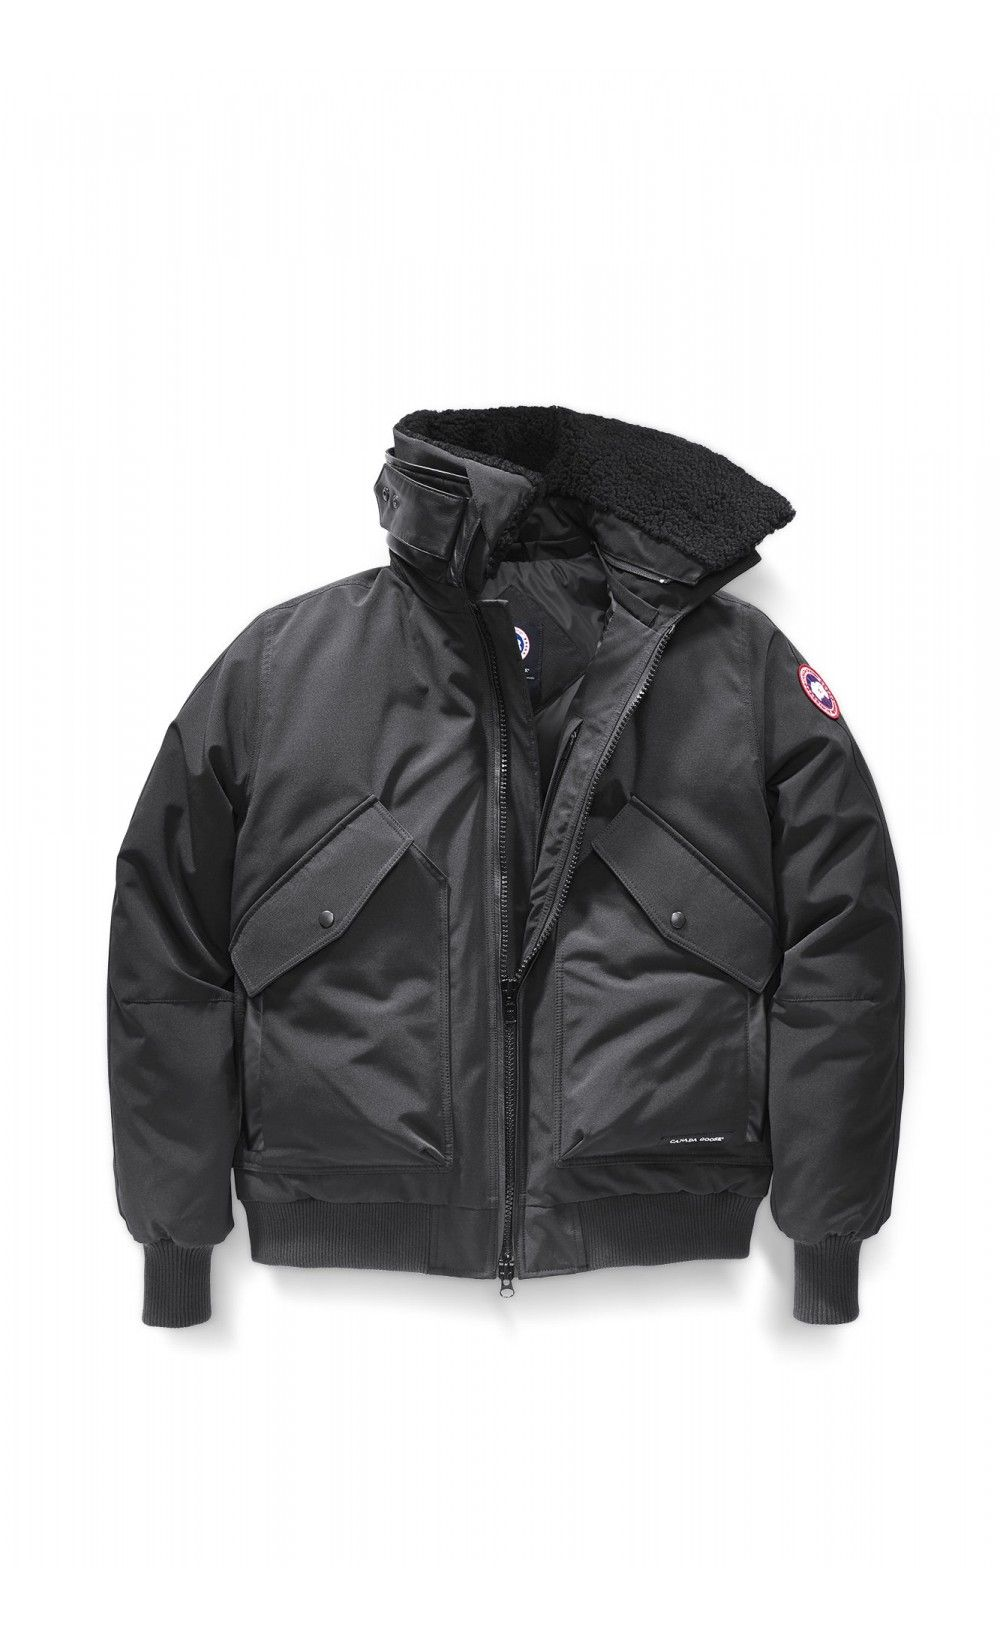 canadagoose99 on Canada goose mens, Bomber jacket